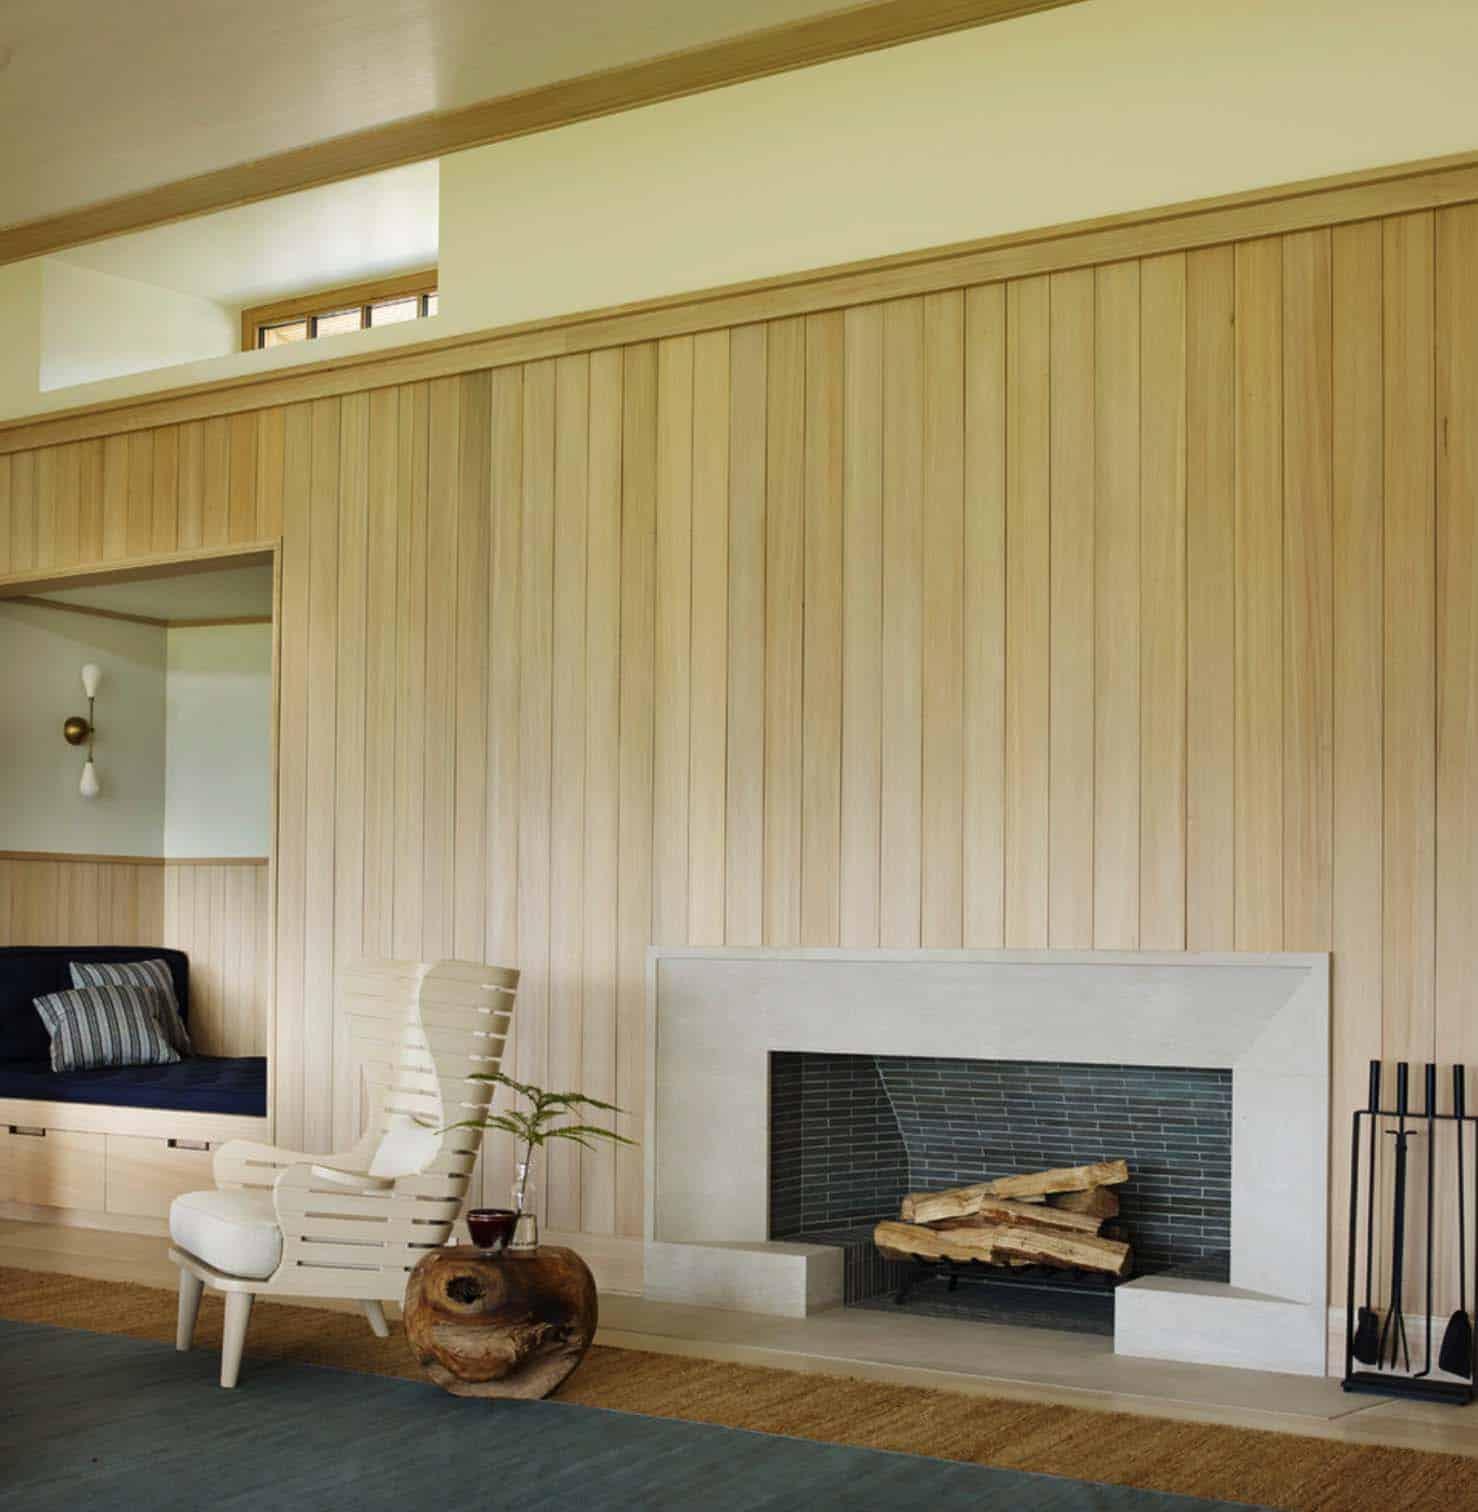 Shingle-Style Beach House-Ike Kligerman Barkley-14-1 Kindesign